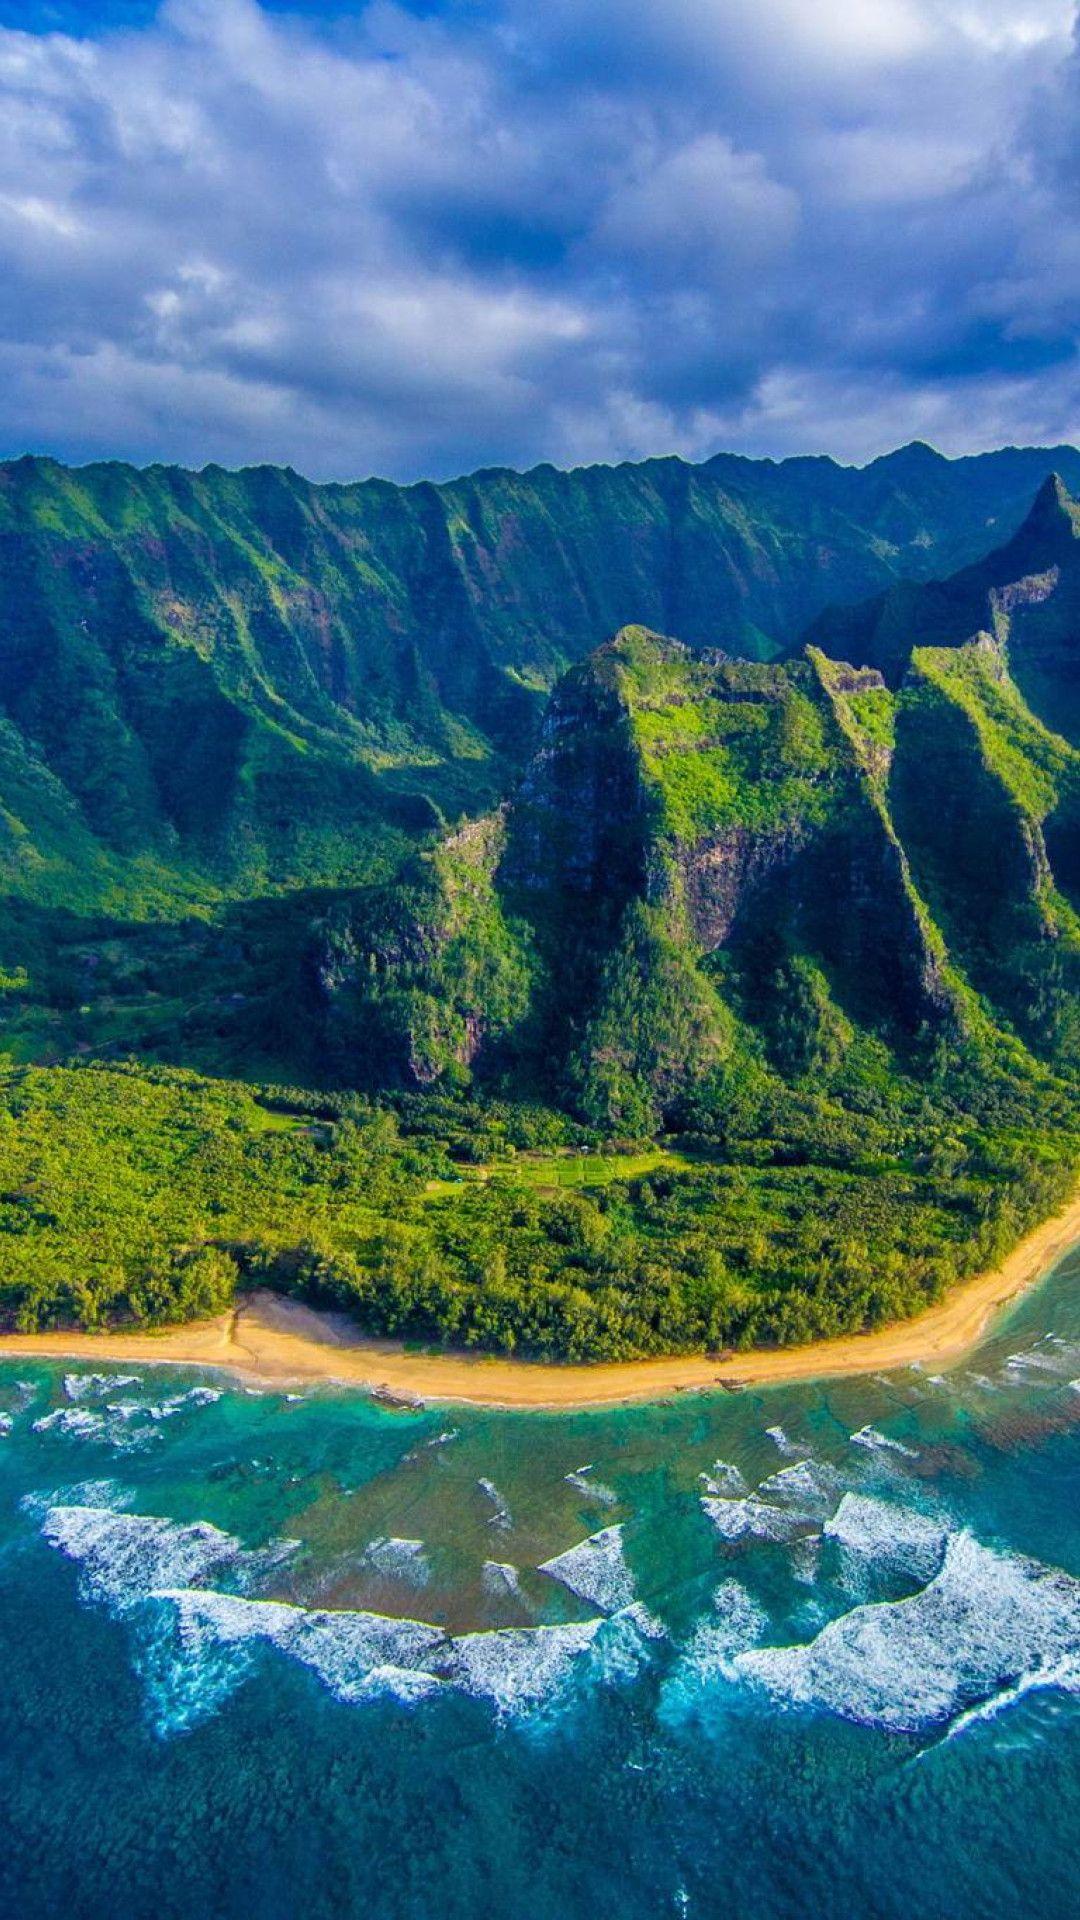 Hawaii iPhone Wallpapers   Top Hawaii iPhone Backgrounds 1080x1920